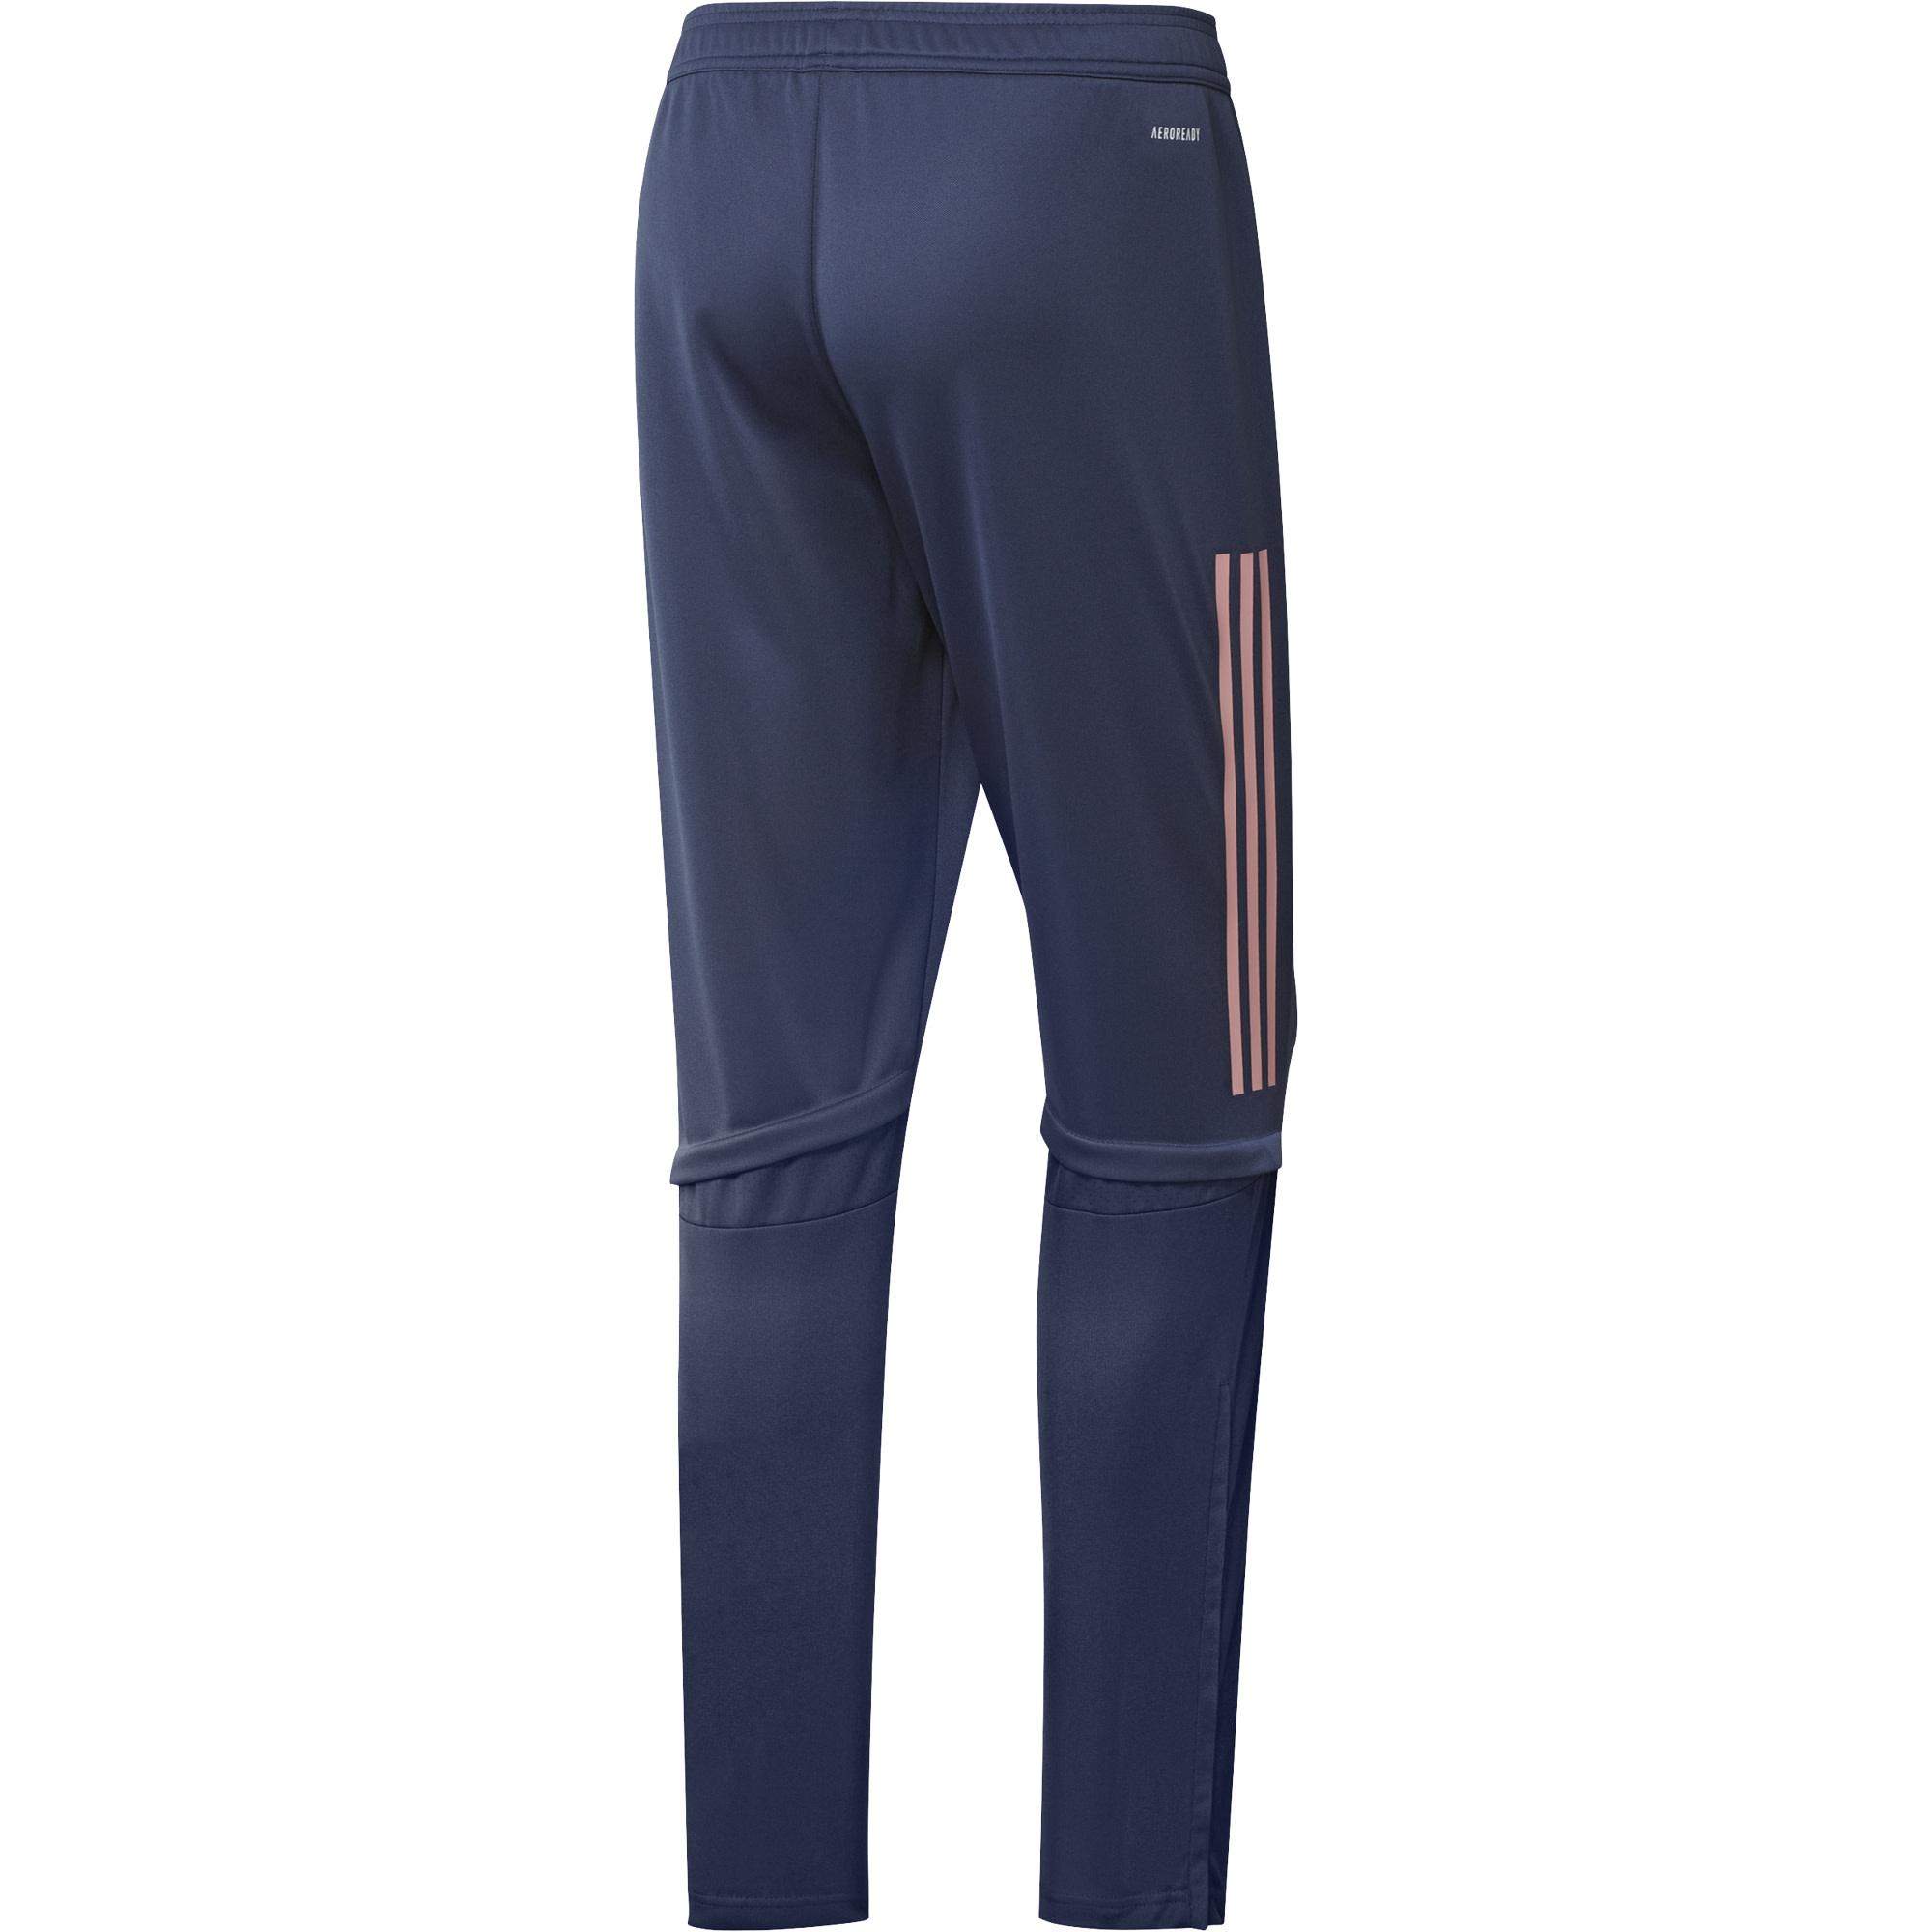 Adidas ADIDAS Arsenal Training Pant '20-'21